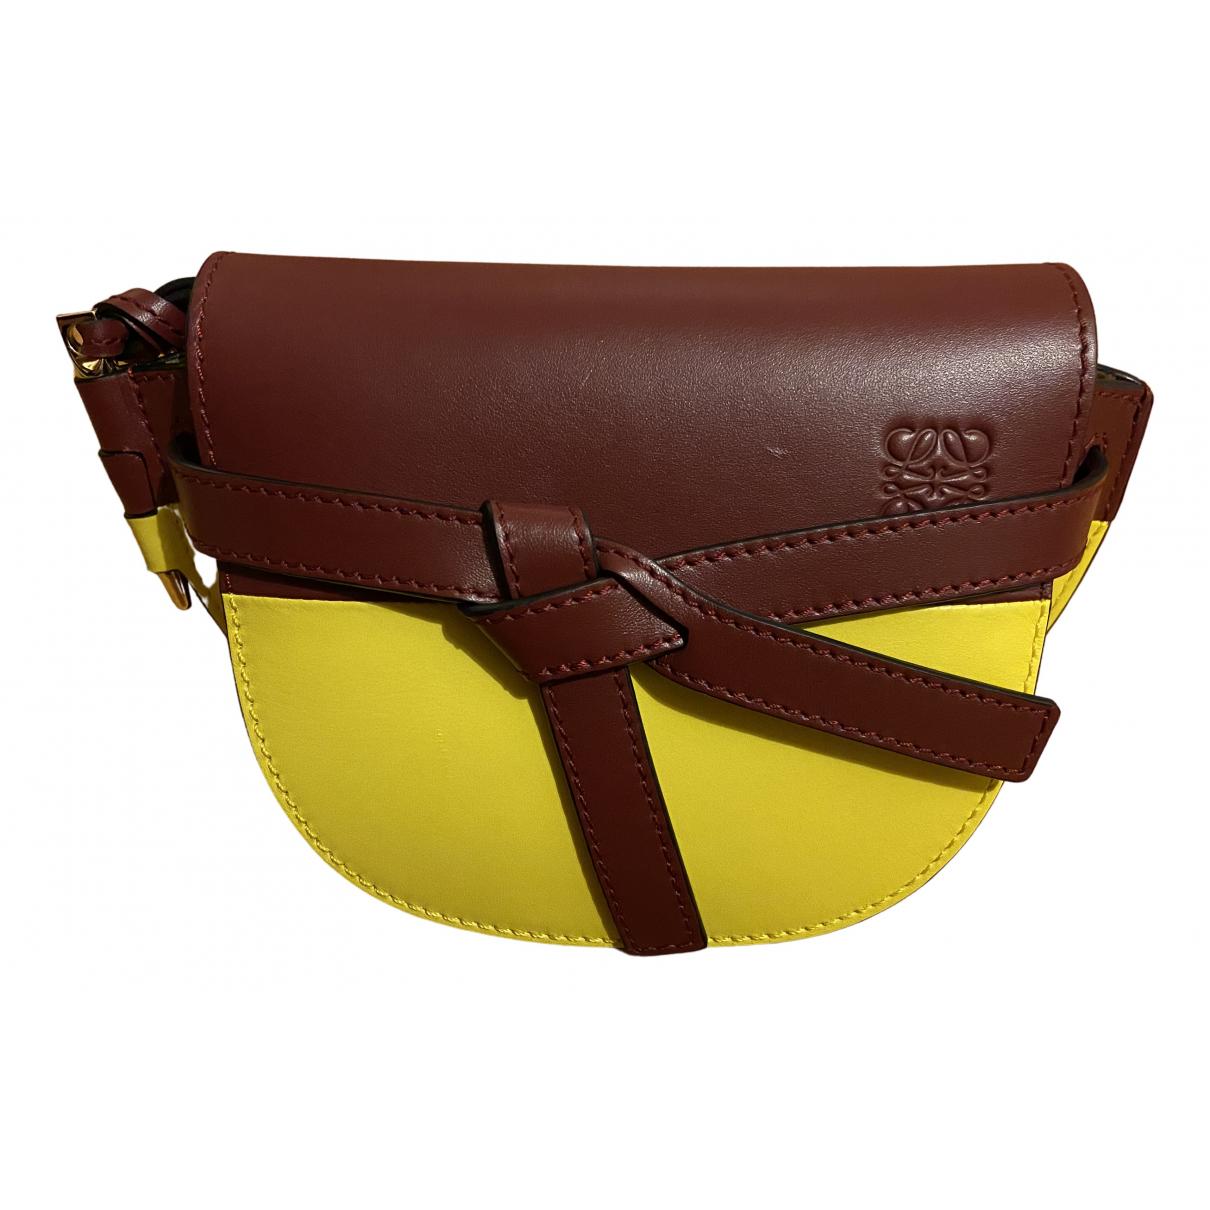 Loewe Gate Burgundy Leather handbag for Women N